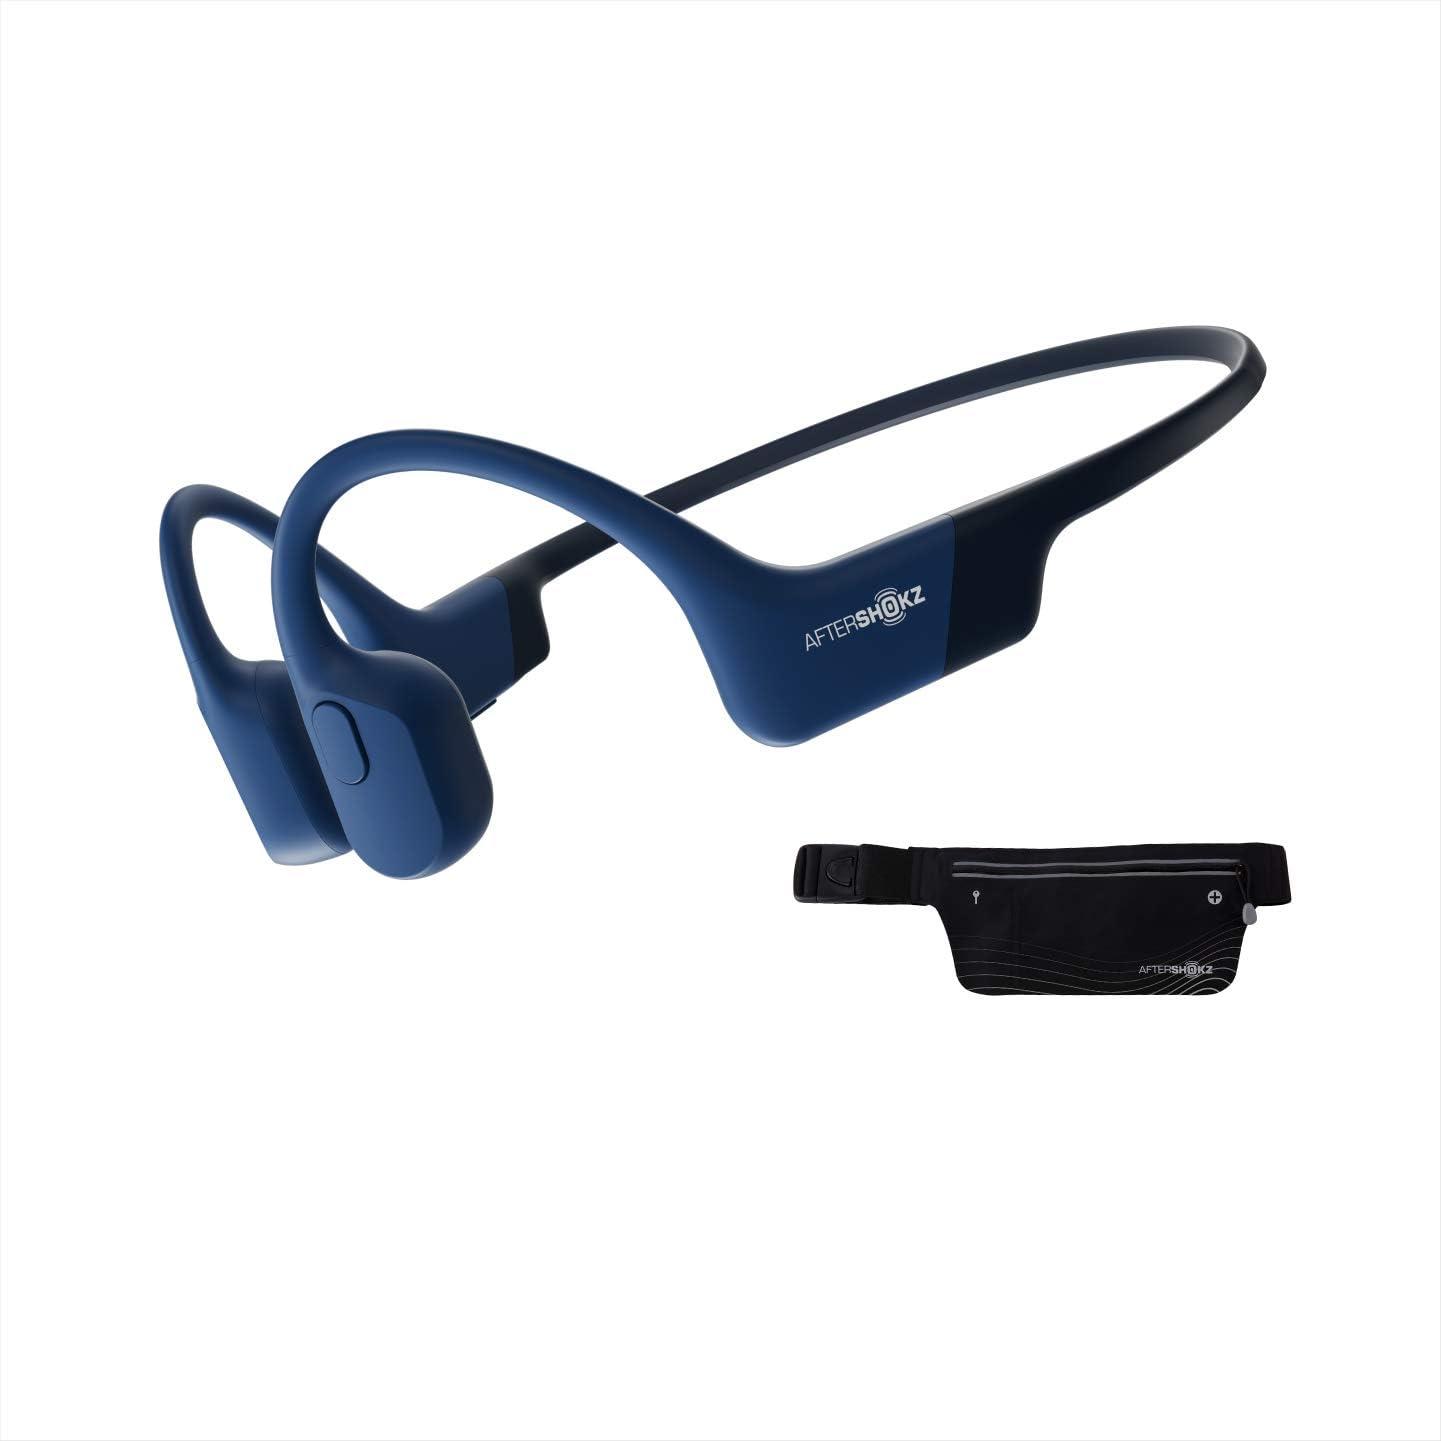 AfterShokz Aeropex IP67 Open-Ear Bluetooth Wireless Bone Conduction Sport Headphones with Built-in Mic (Blue Eclipse) + Sport Belt